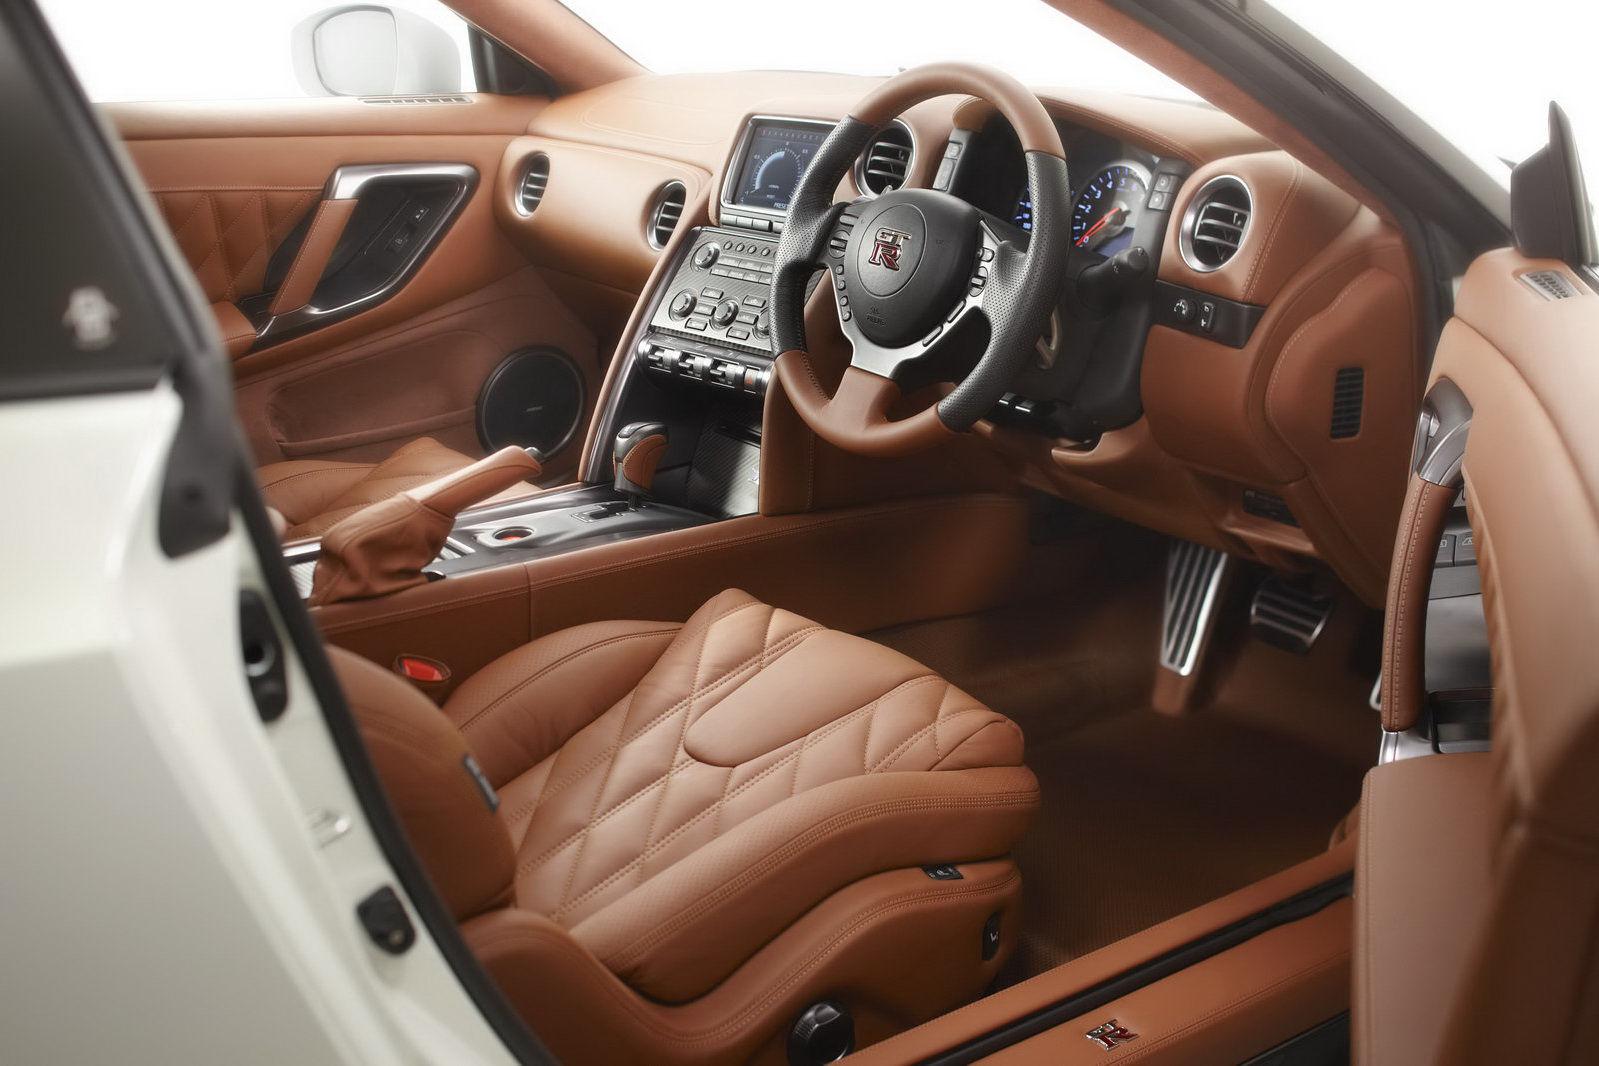 Luxurious New Nissan Gt R Egoist Special 歴代 スカイライン Gt